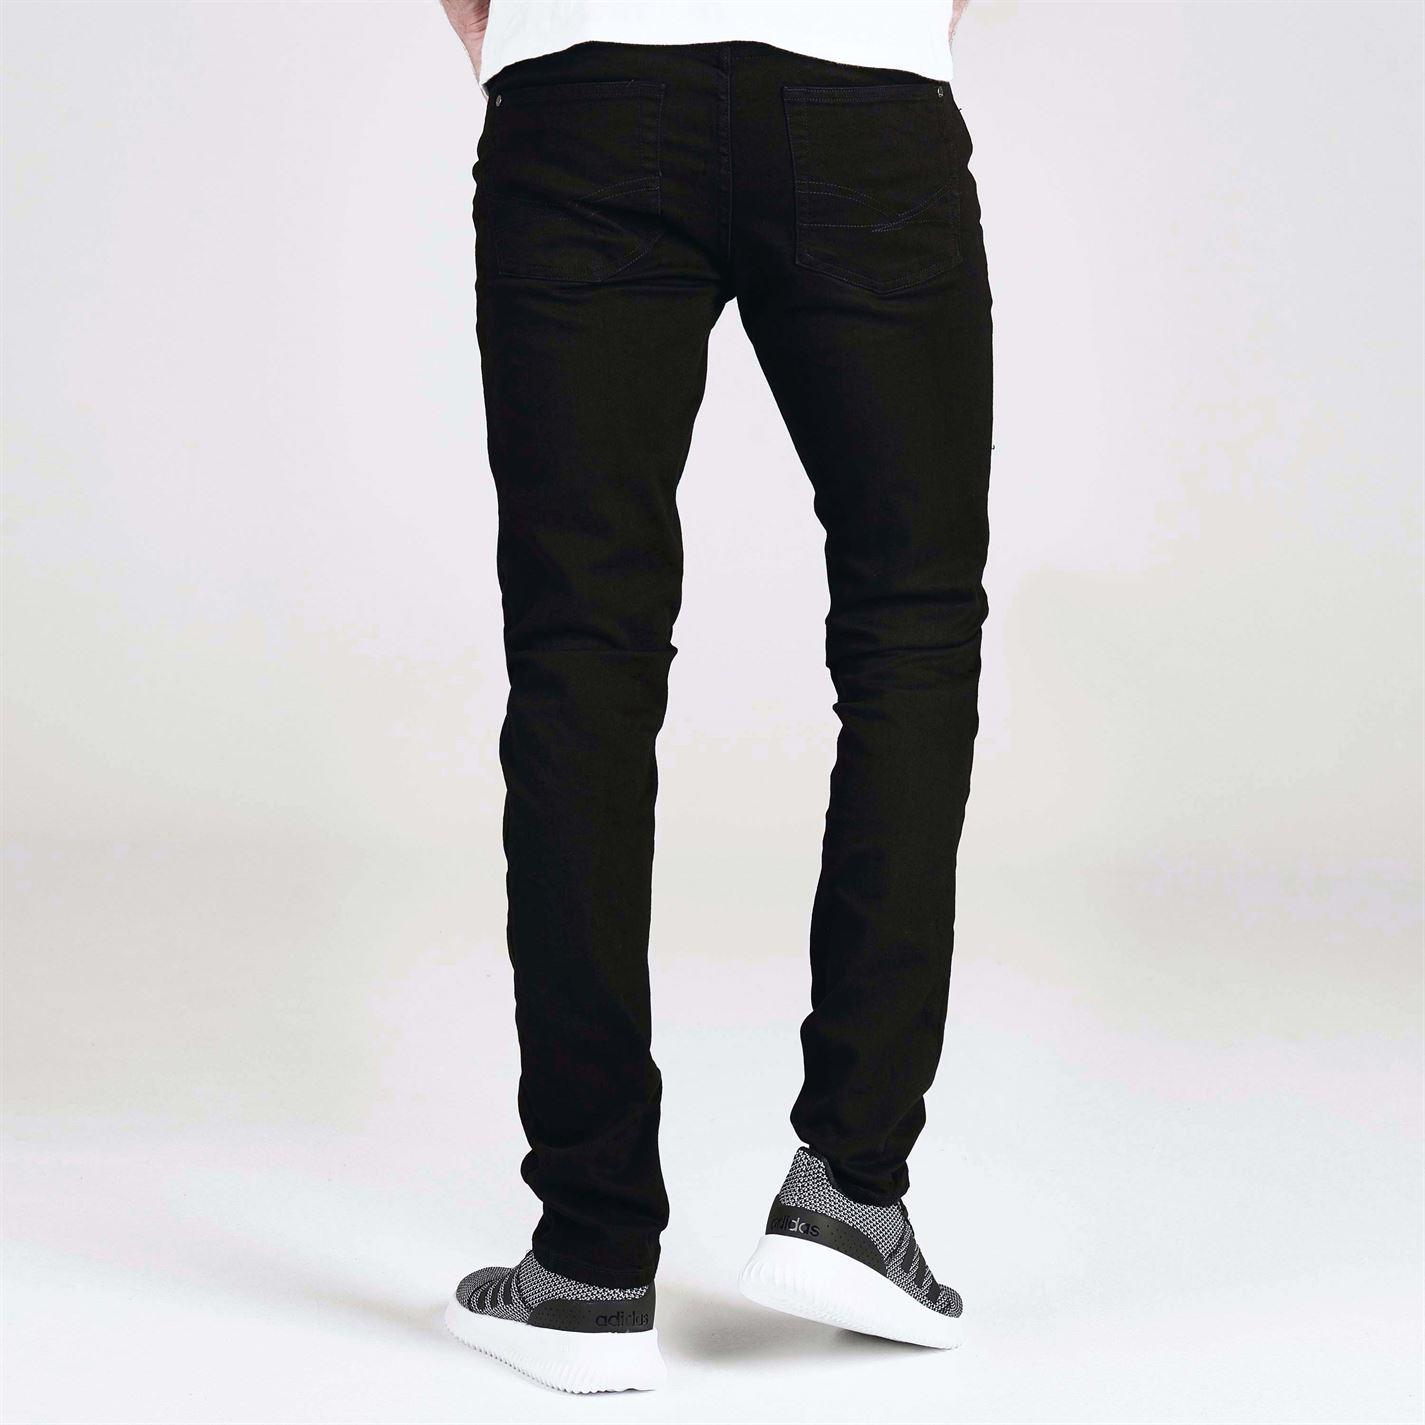 Jeans-Denim-Firetrap-Skinny-Mens-Trouser-Black thumbnail 19